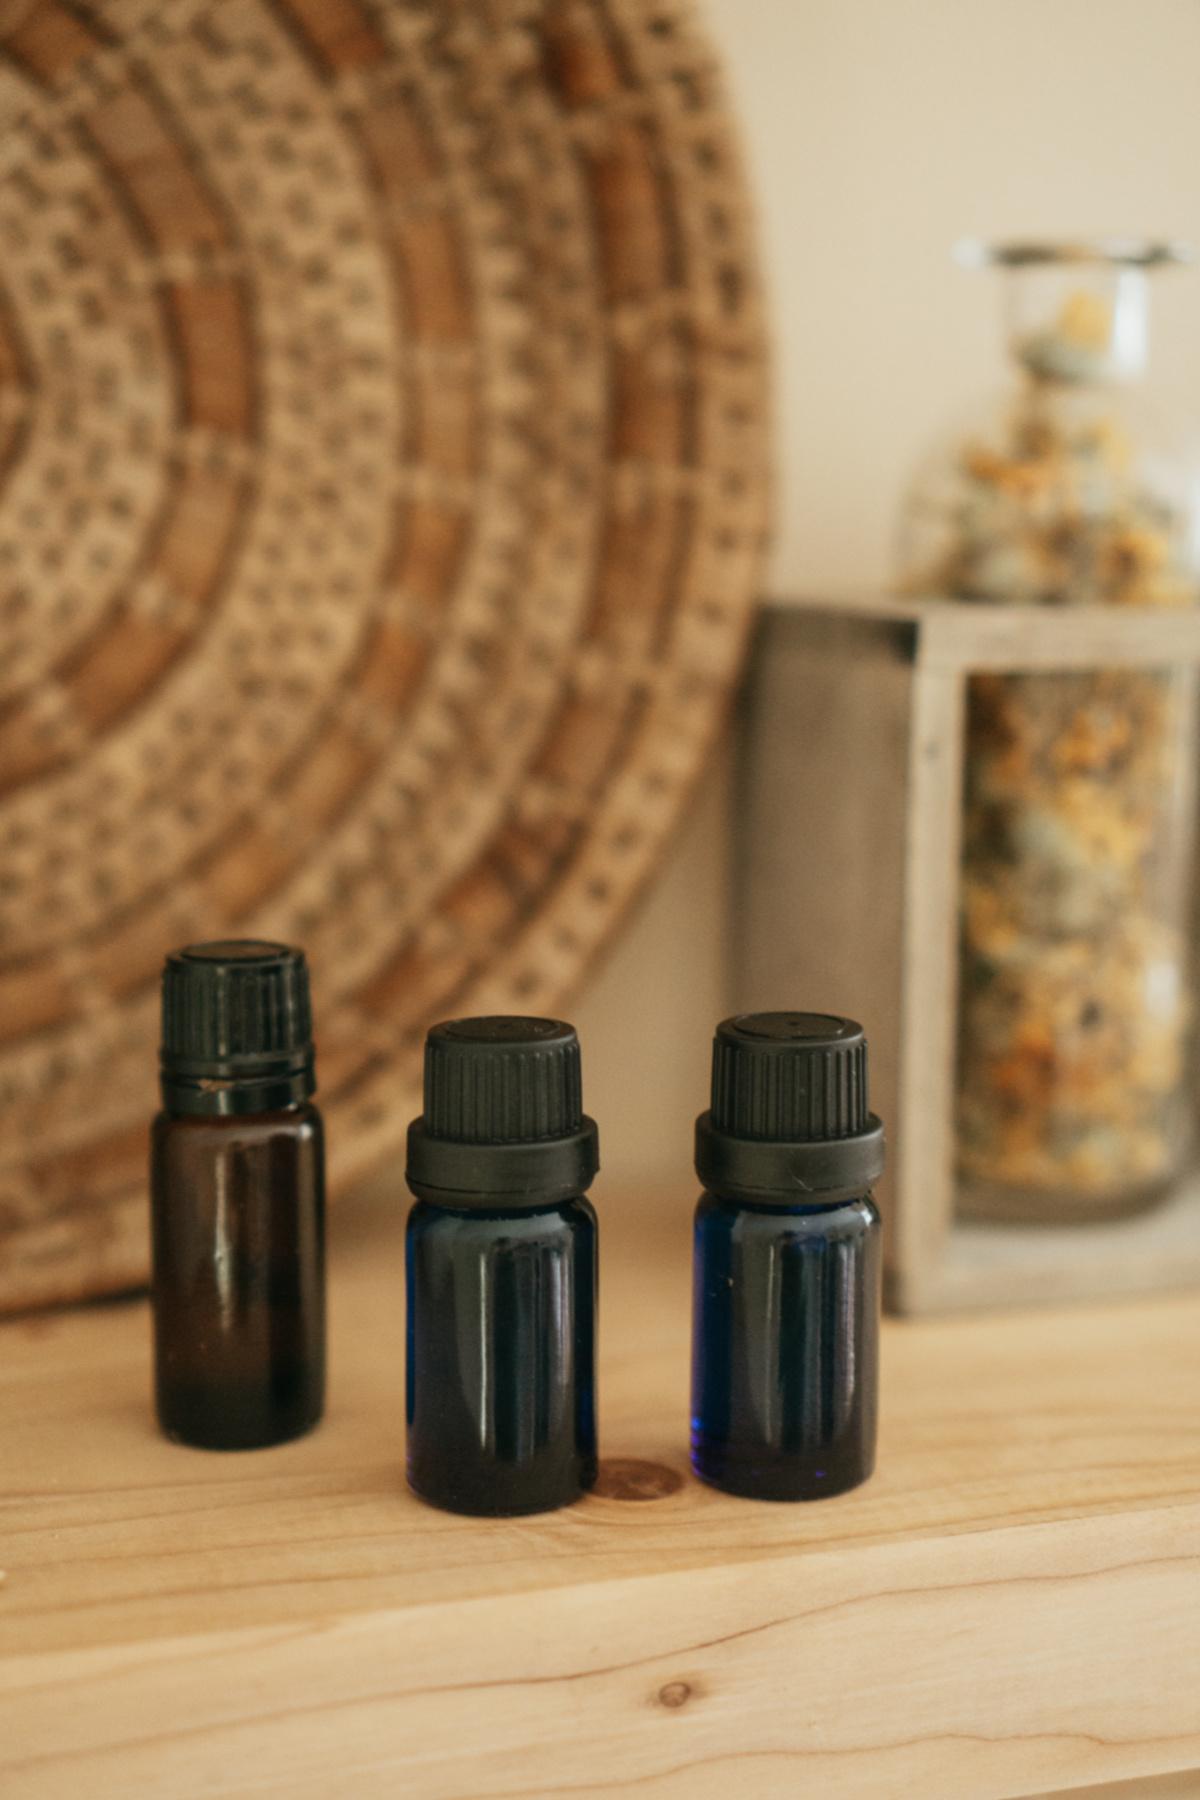 essential oil bottles next to a wicker basket